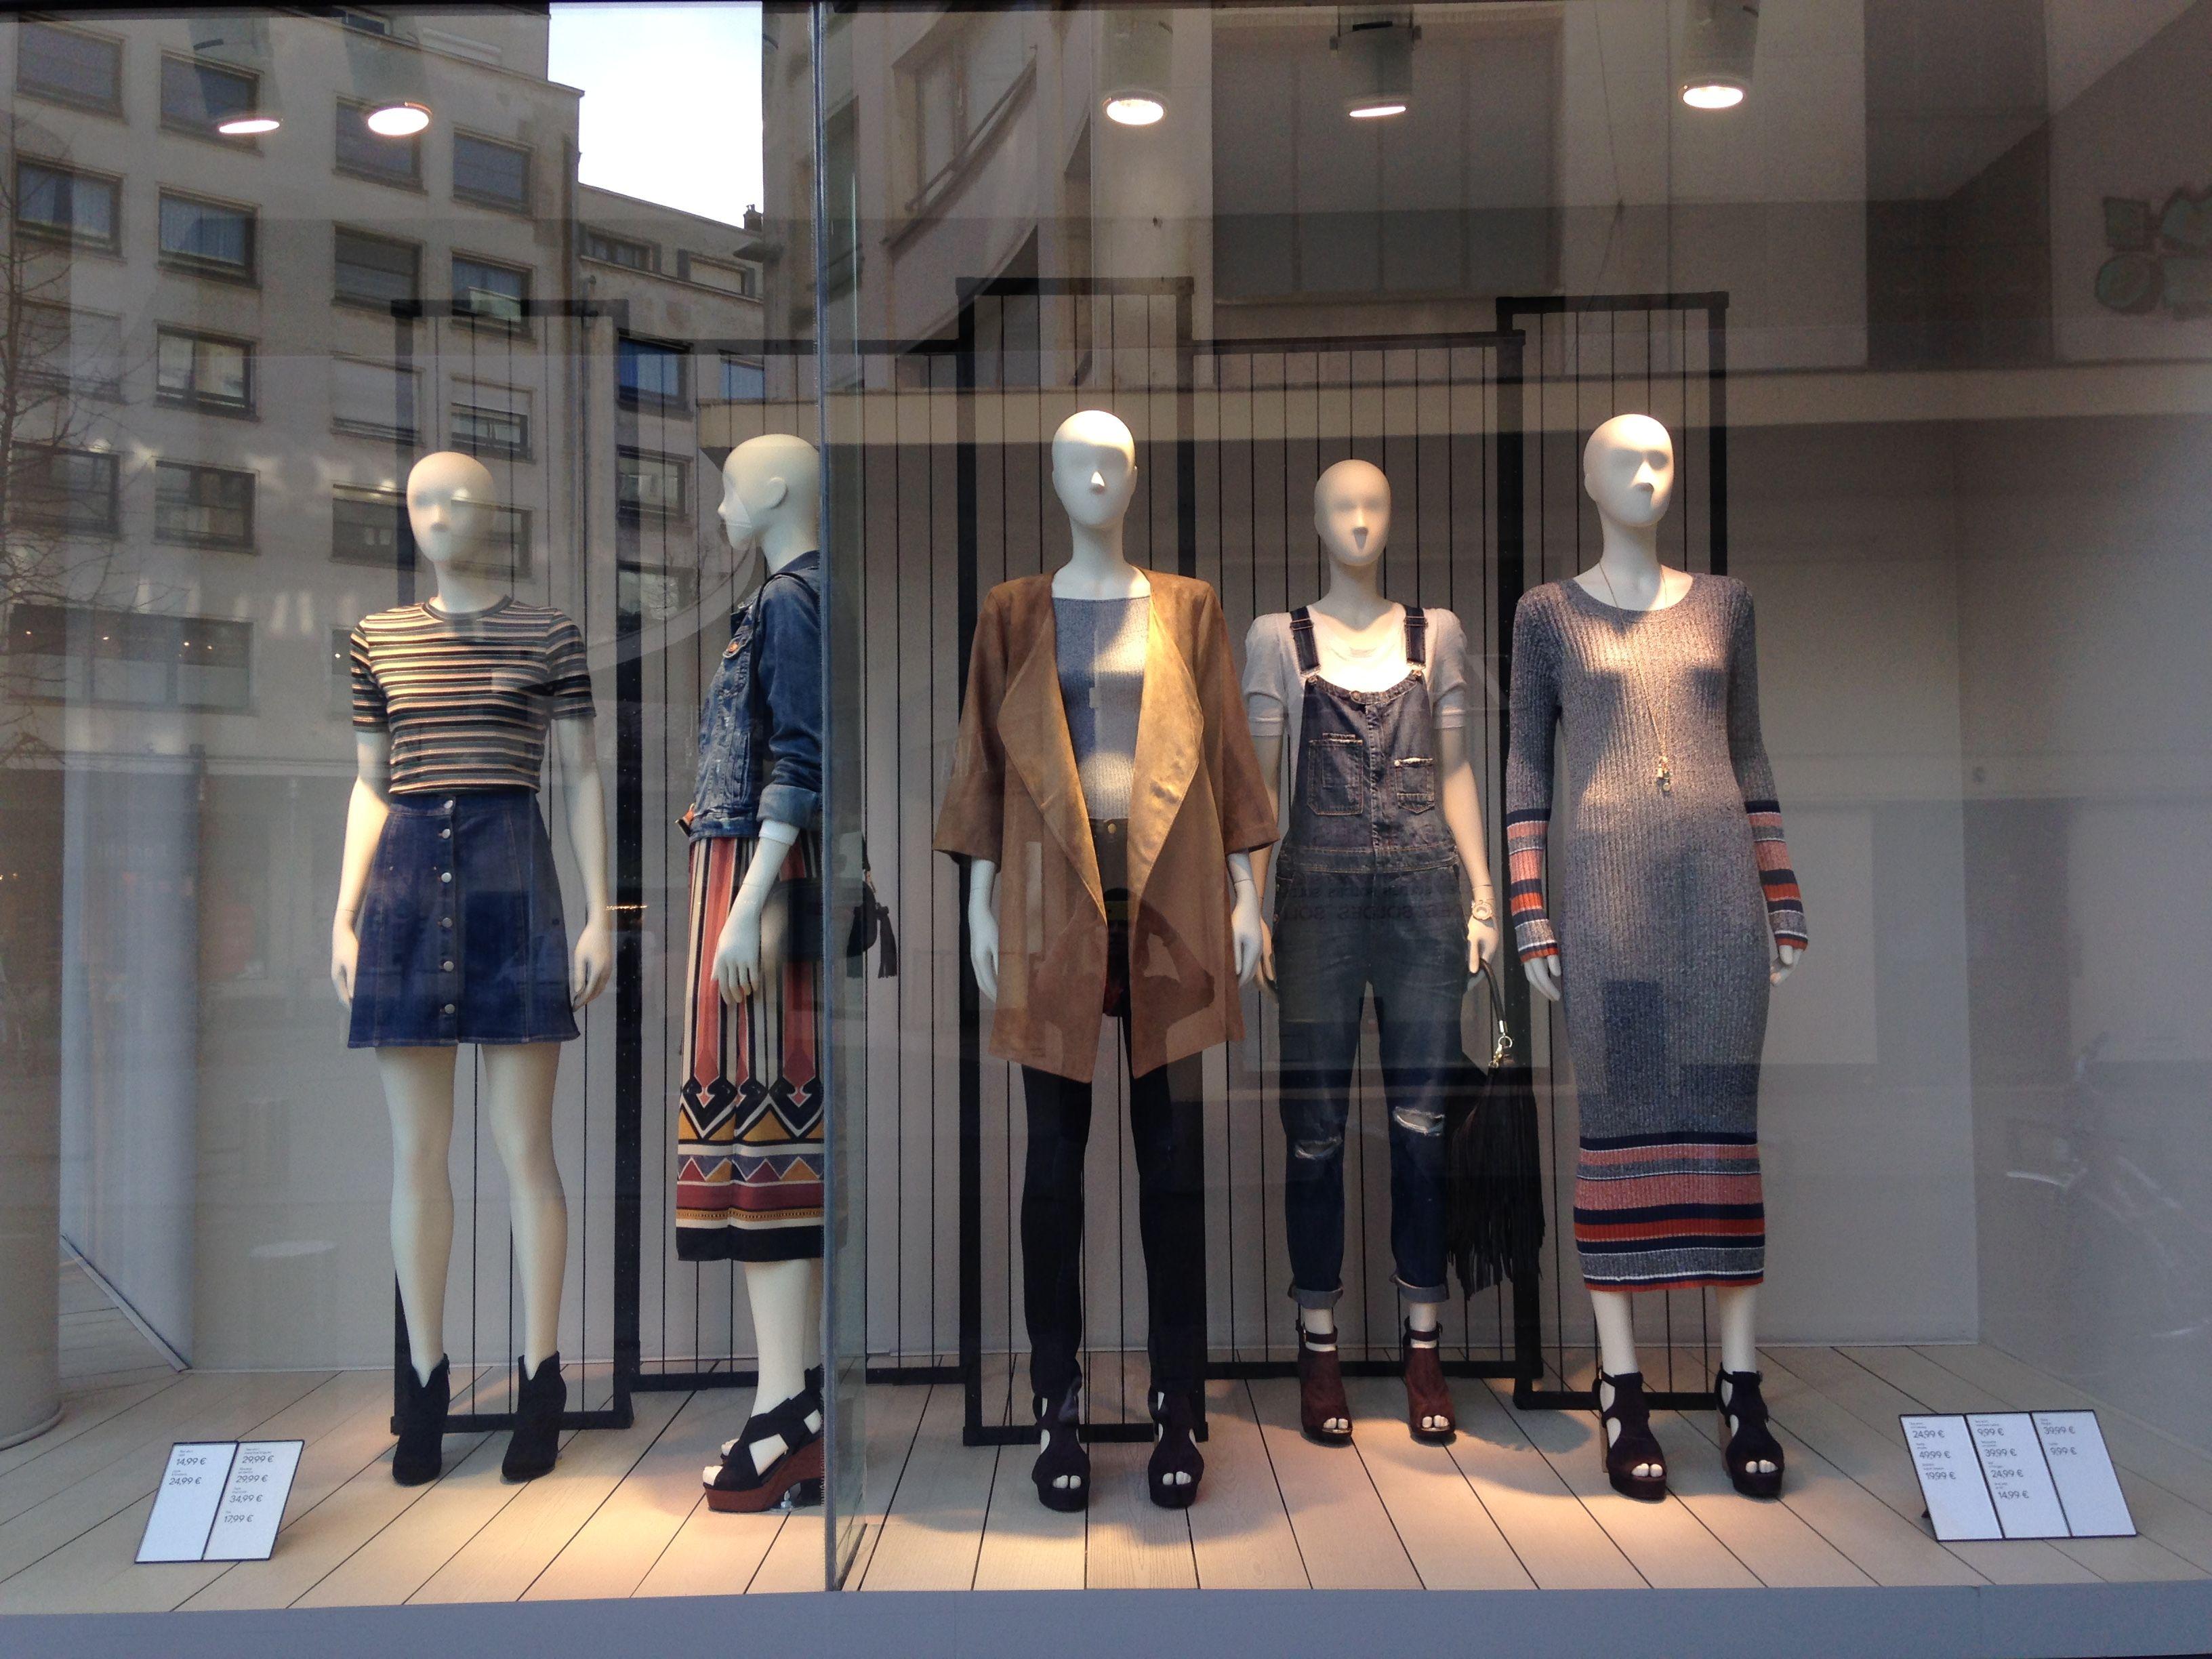 Venezia fashion house piaseczno Lista referencyjna KD i RCP